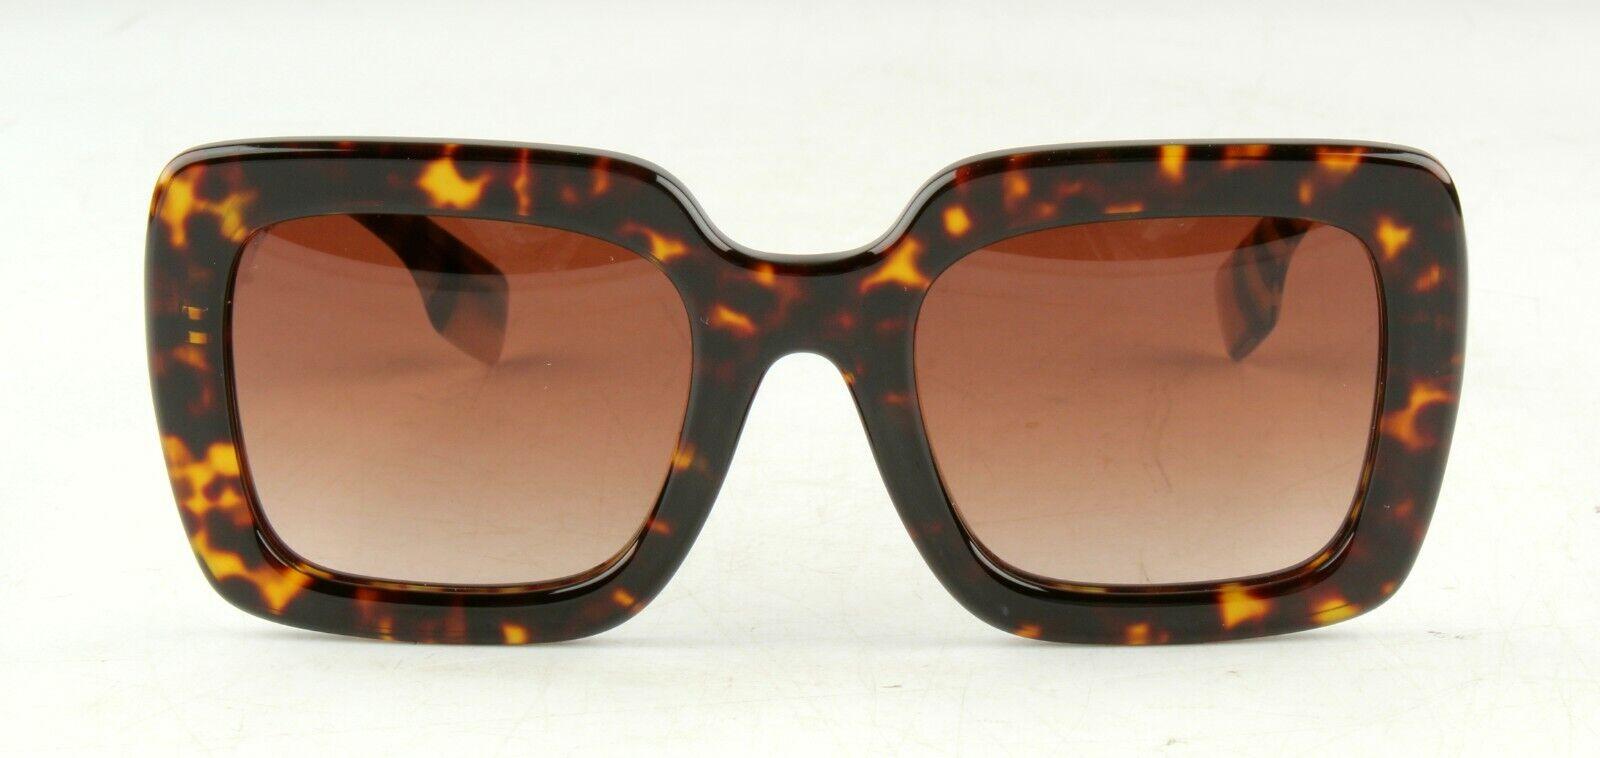 *AUTHENTIC Burberry Women's Square Sunglasses B4284 3903/13